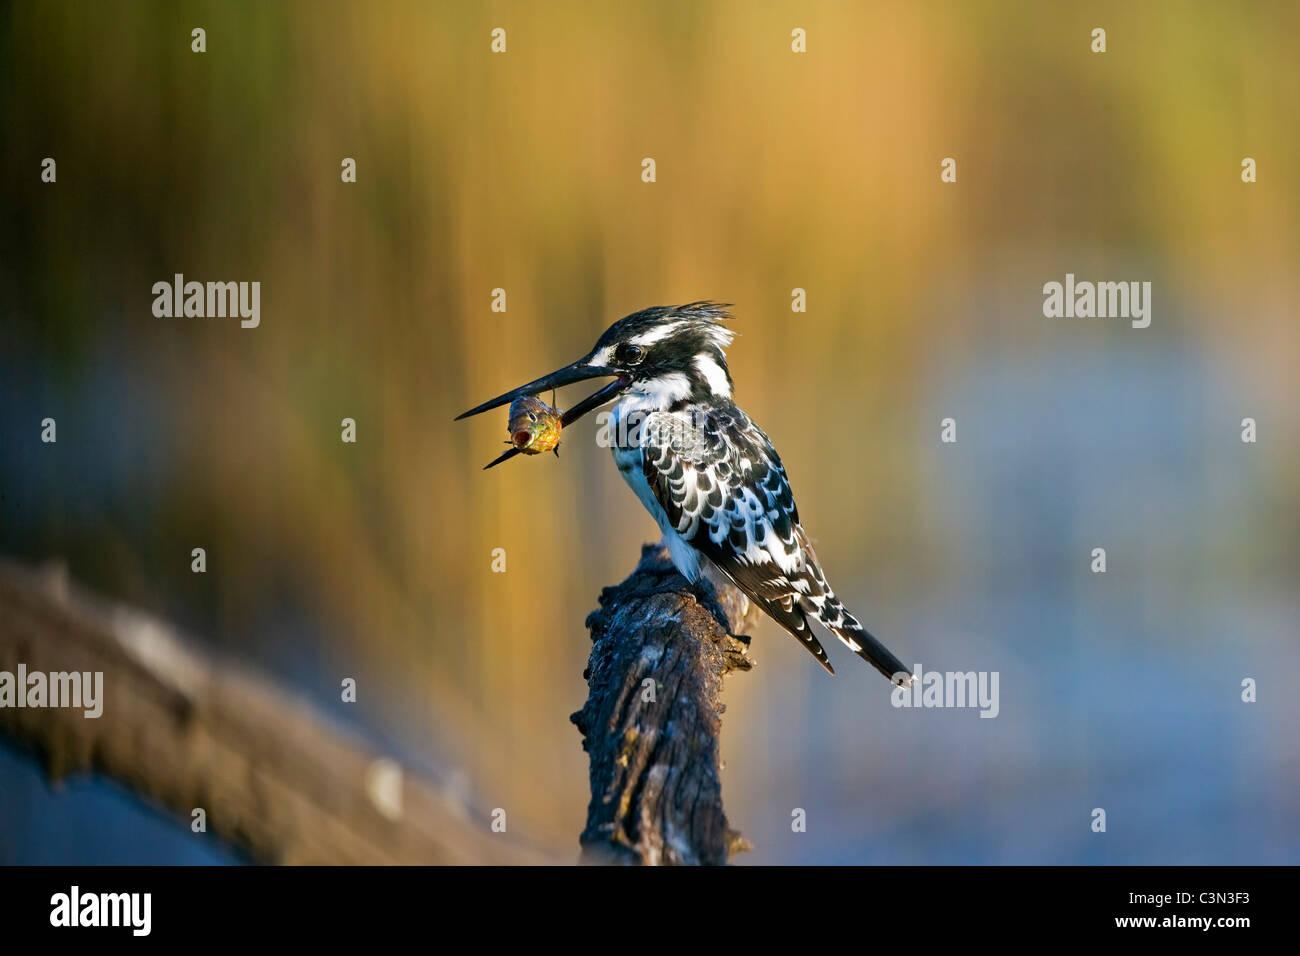 South Africa, near Rustenburg, Pilanesberg National Park. Mankwe Hide. Two Pied Kingfishers, Ceryle rudis, perched - Stock Image